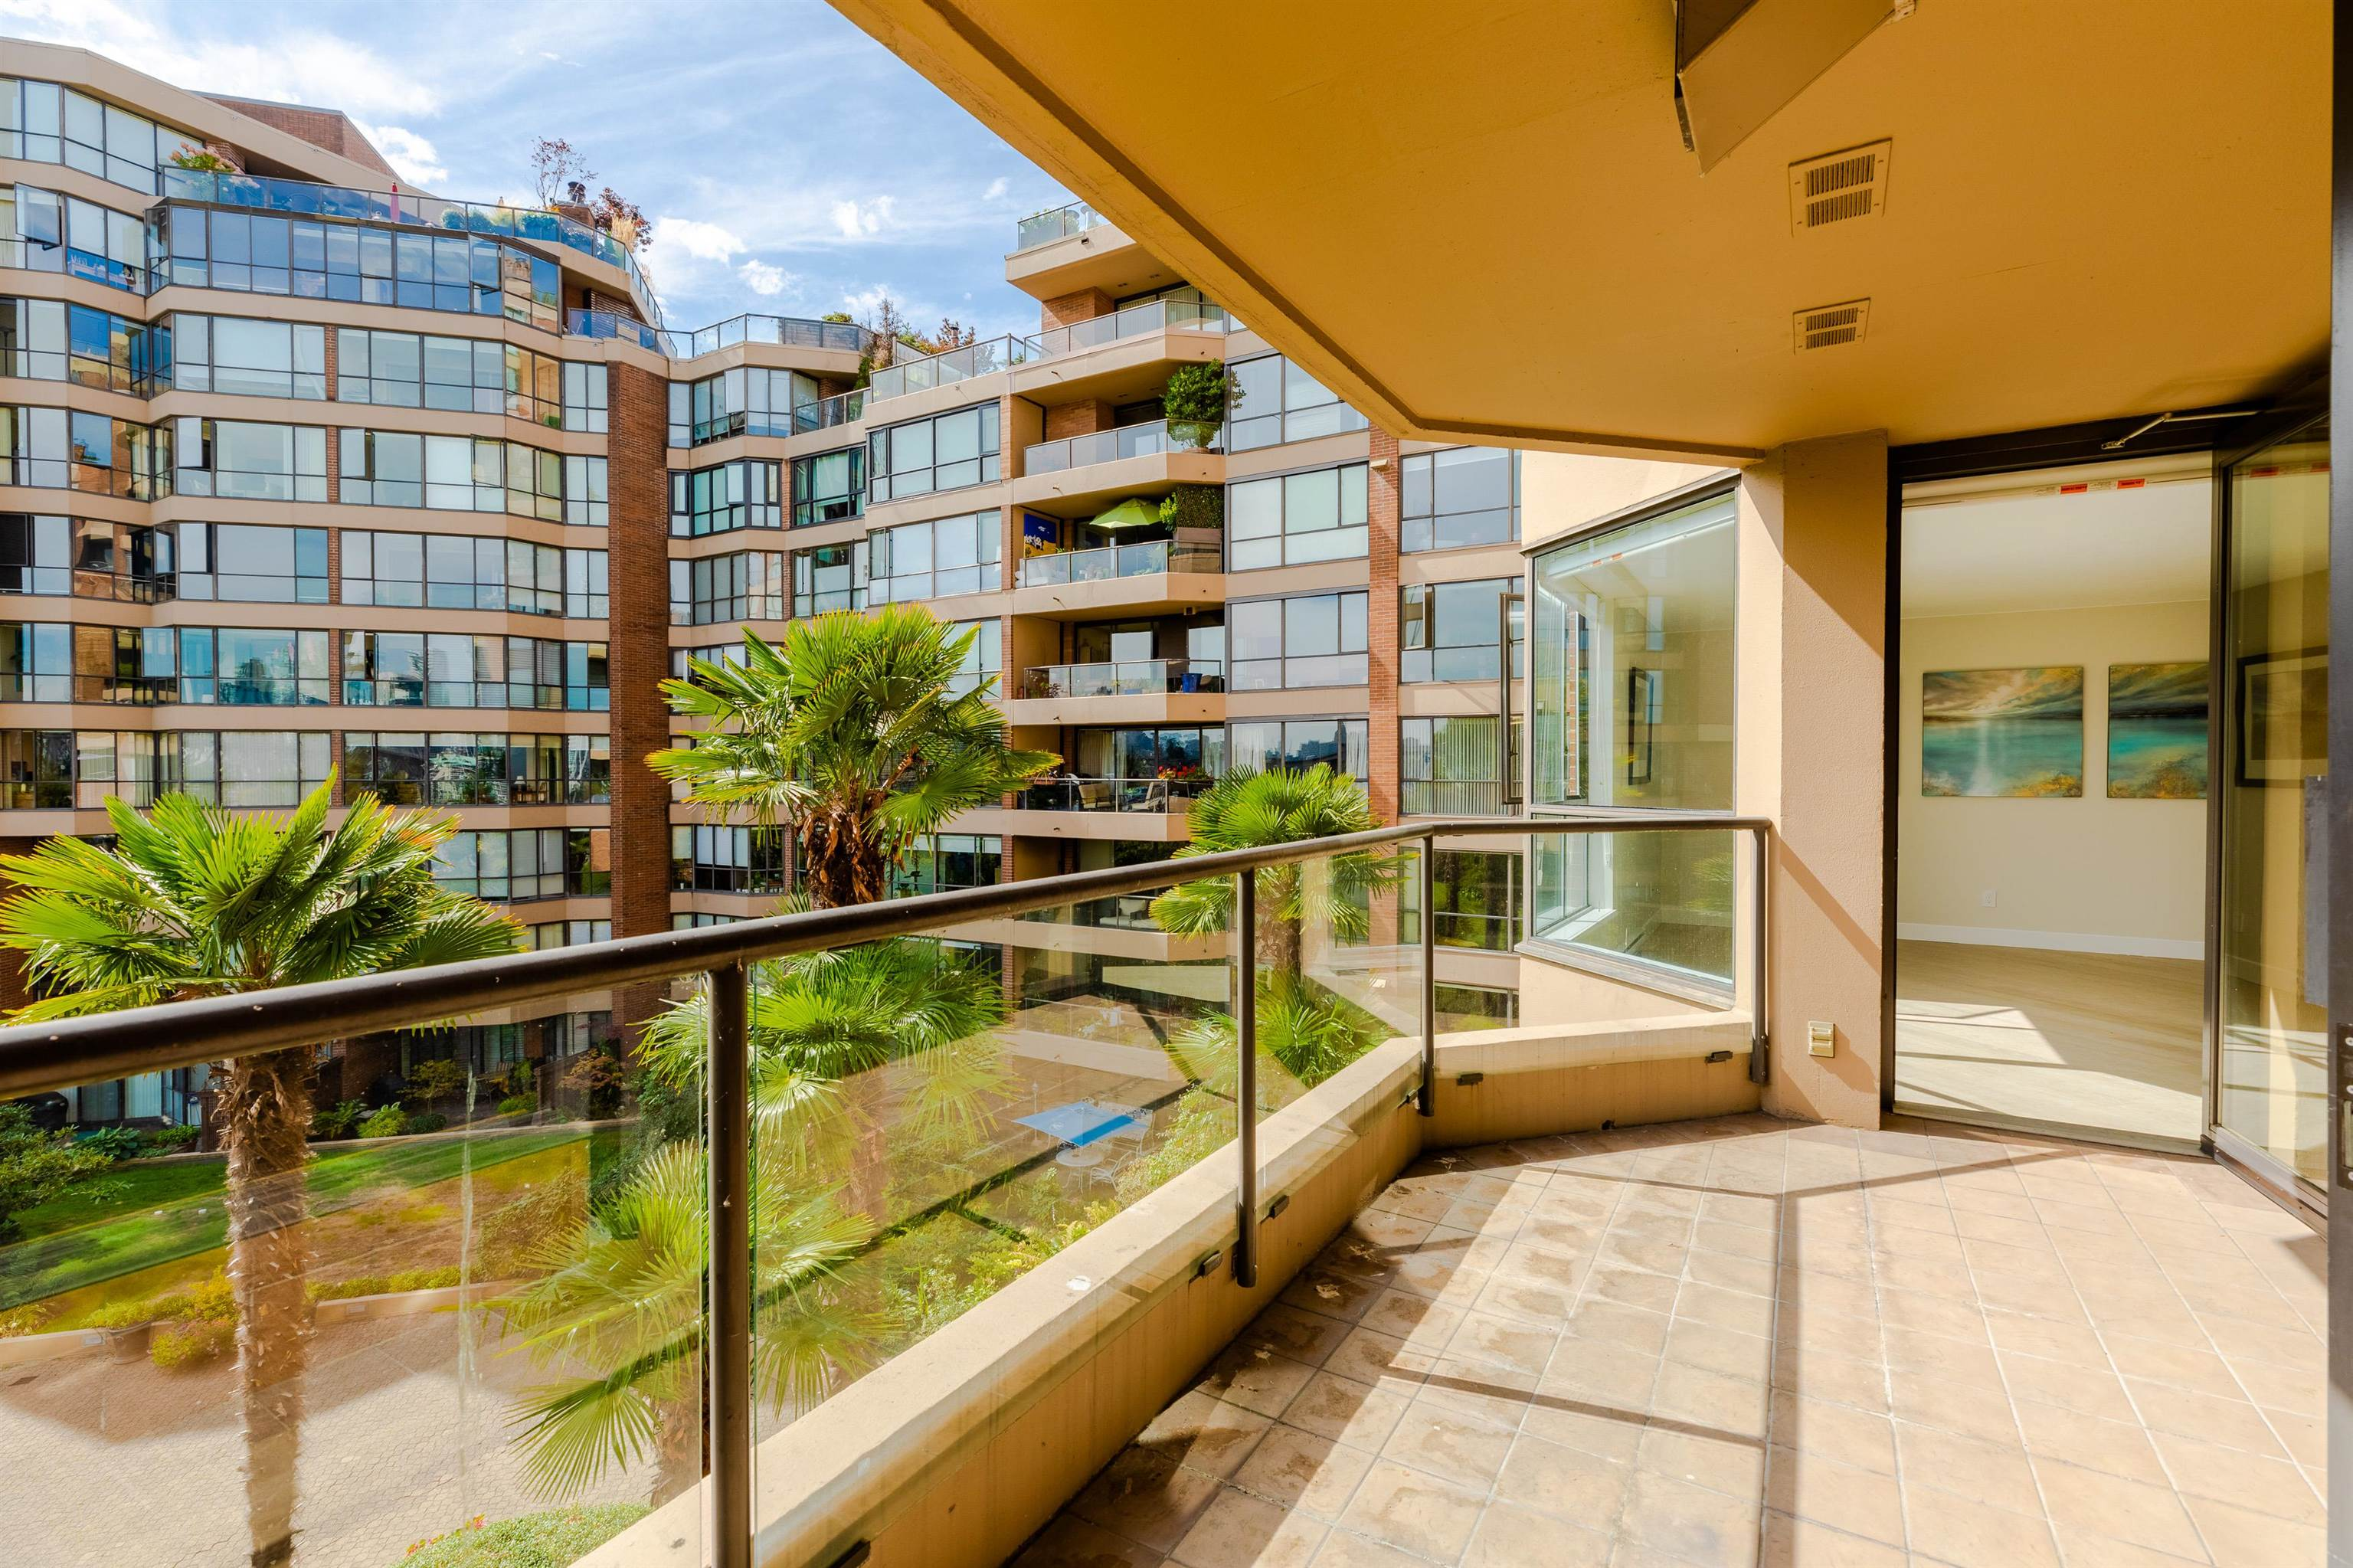 406 1450 PENNYFARTHING DRIVE - False Creek Apartment/Condo for sale, 2 Bedrooms (R2617259) - #35